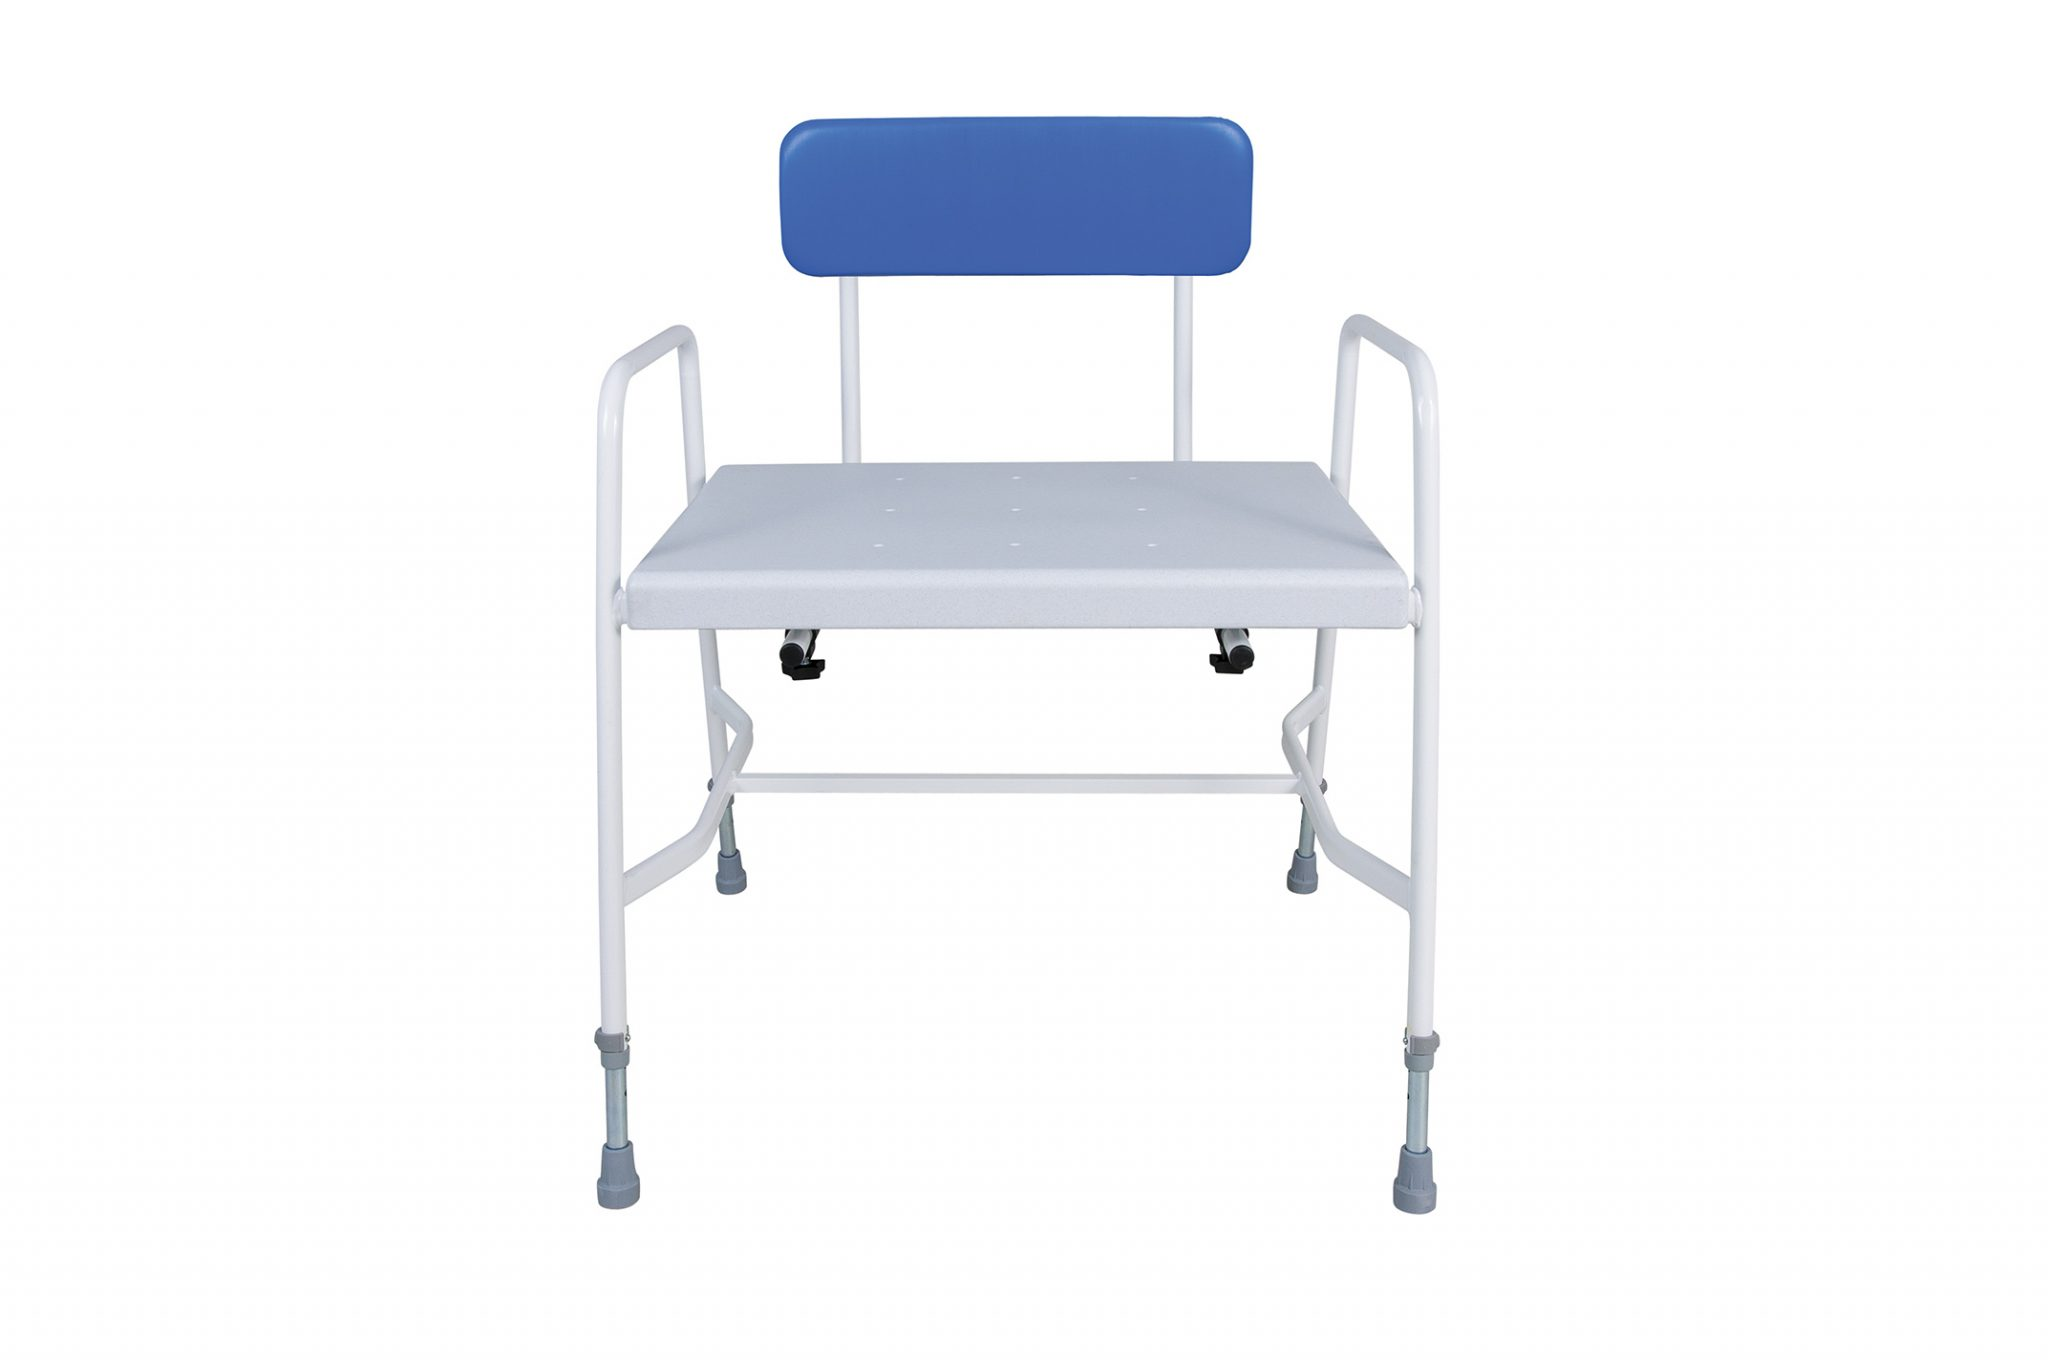 X281 Bariatric Shower Chair Cefndy Healthcare